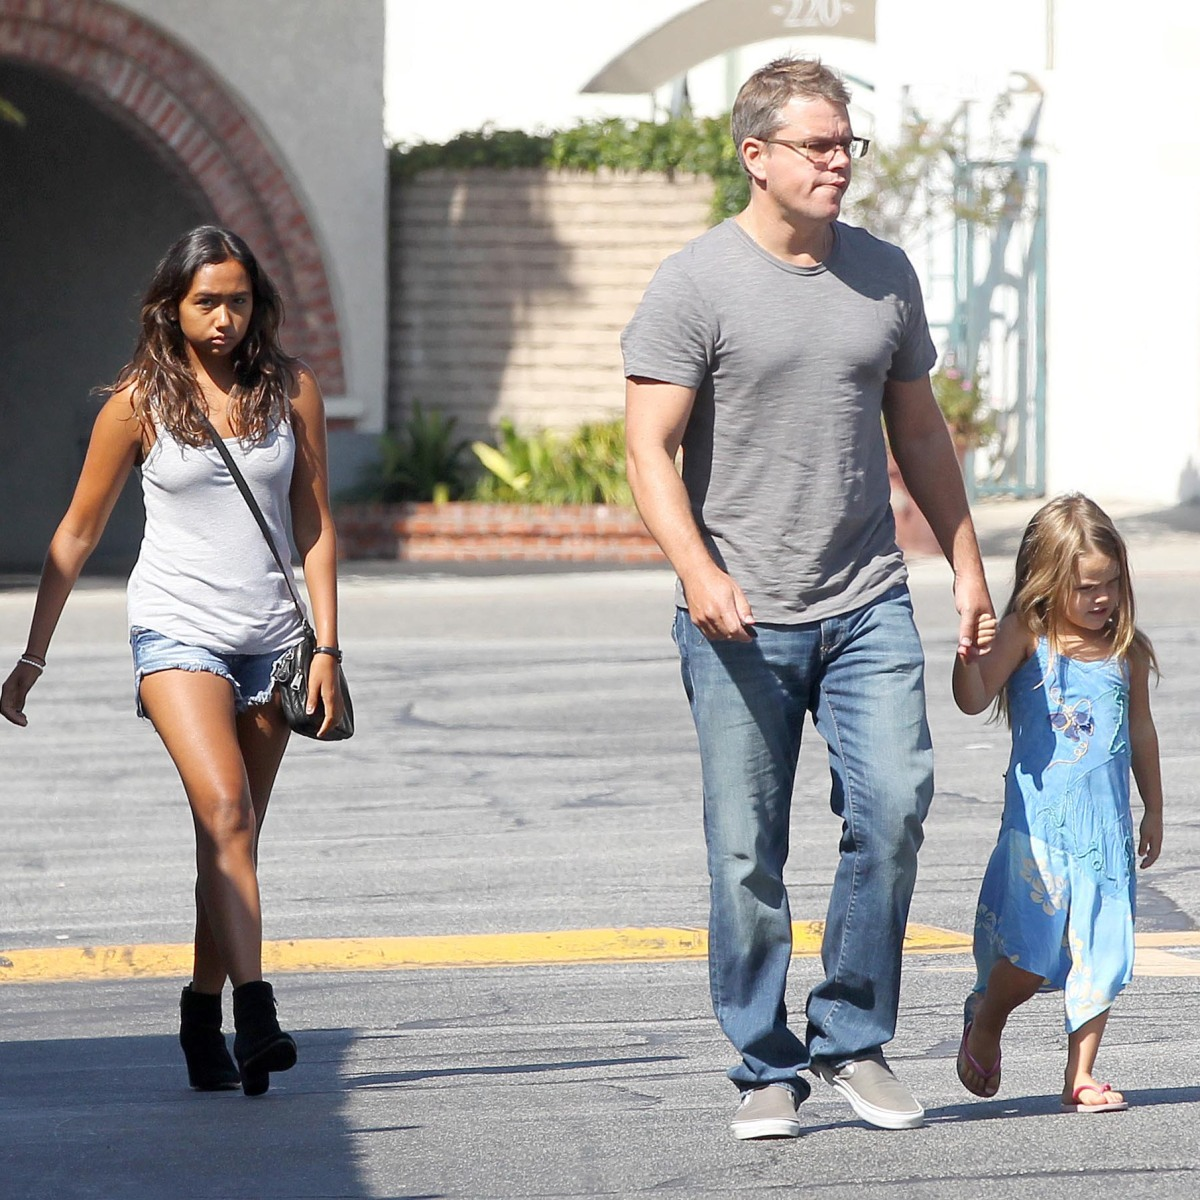 Matt Damon Daughters: Meet the Actor's 4 Kids With Luciana Barroso